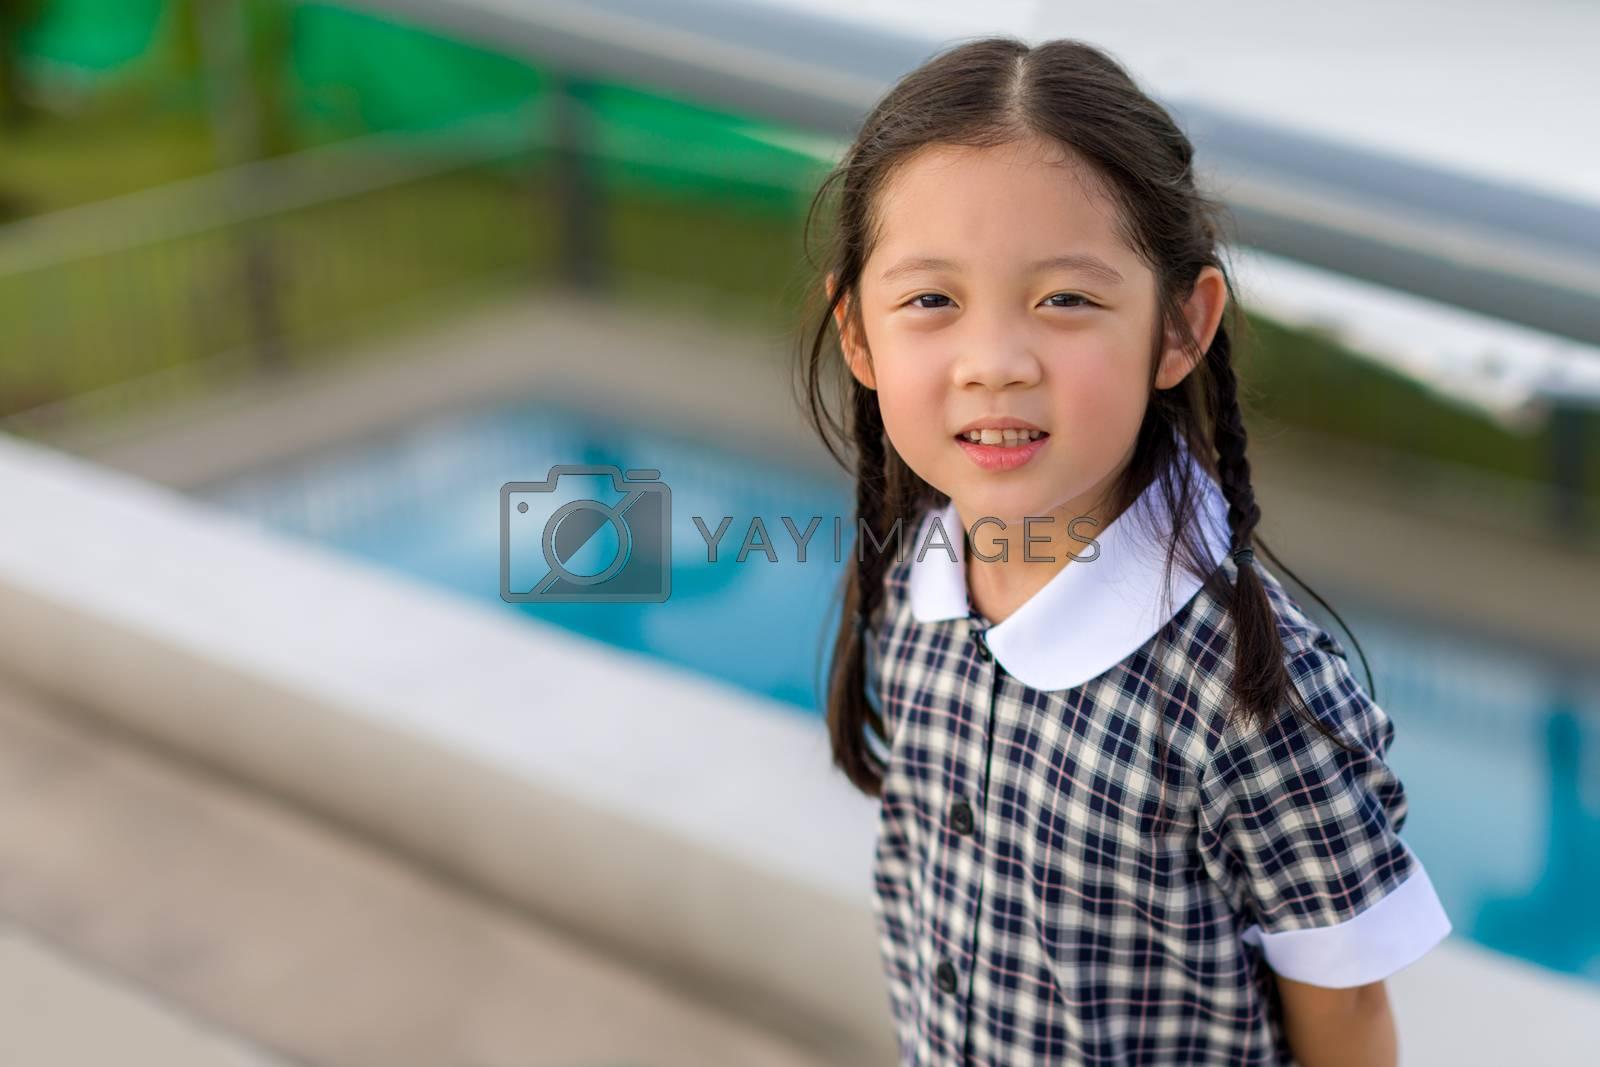 Smiling child, girl, in school uniform portrait.